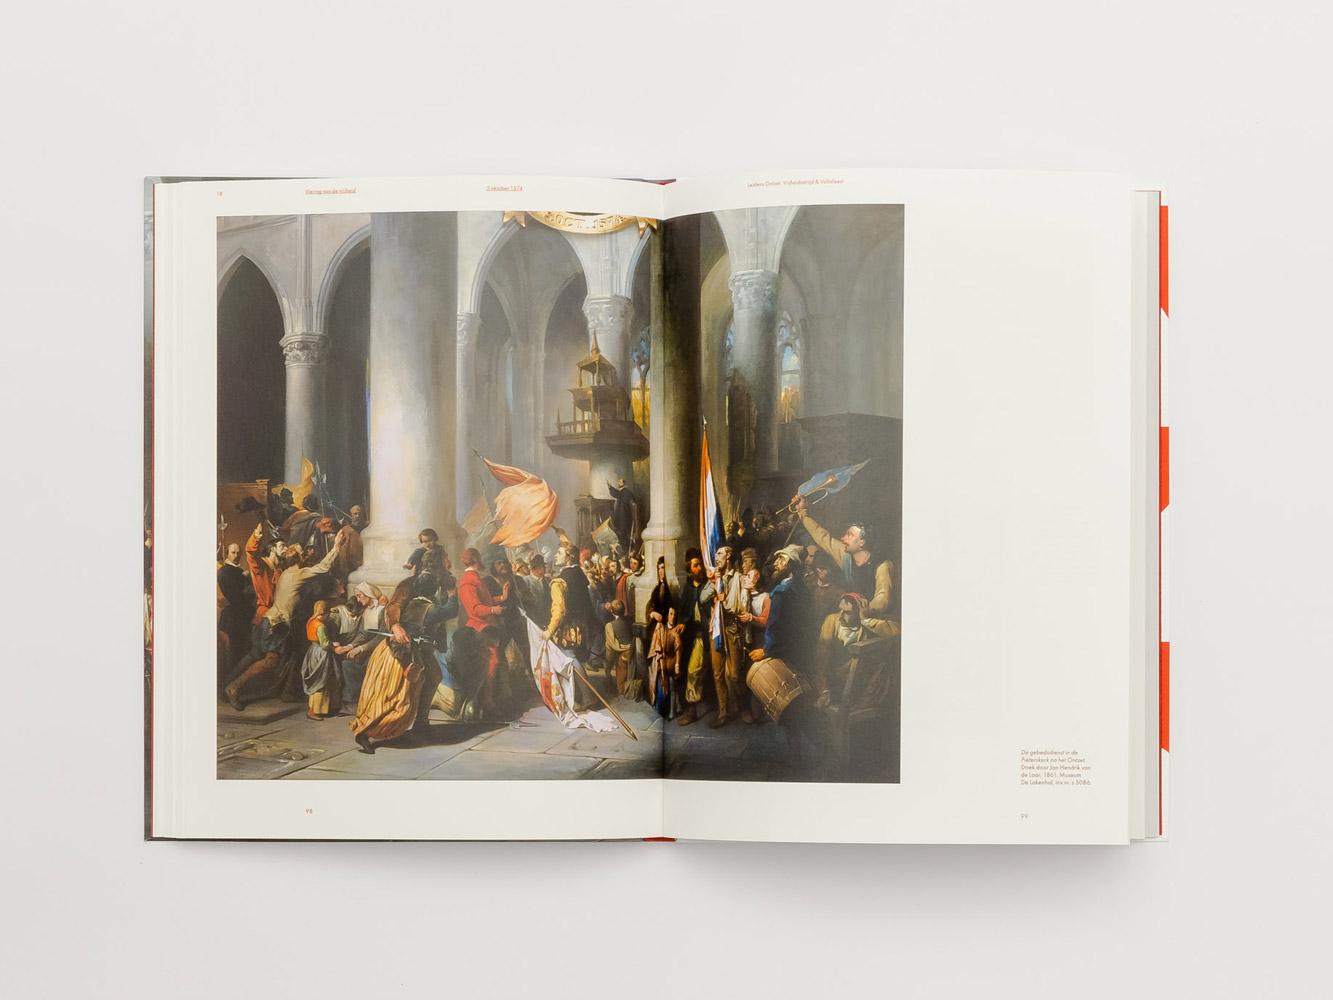 museum de lakenhal leidens ontzet publicatie nr 6 jpg